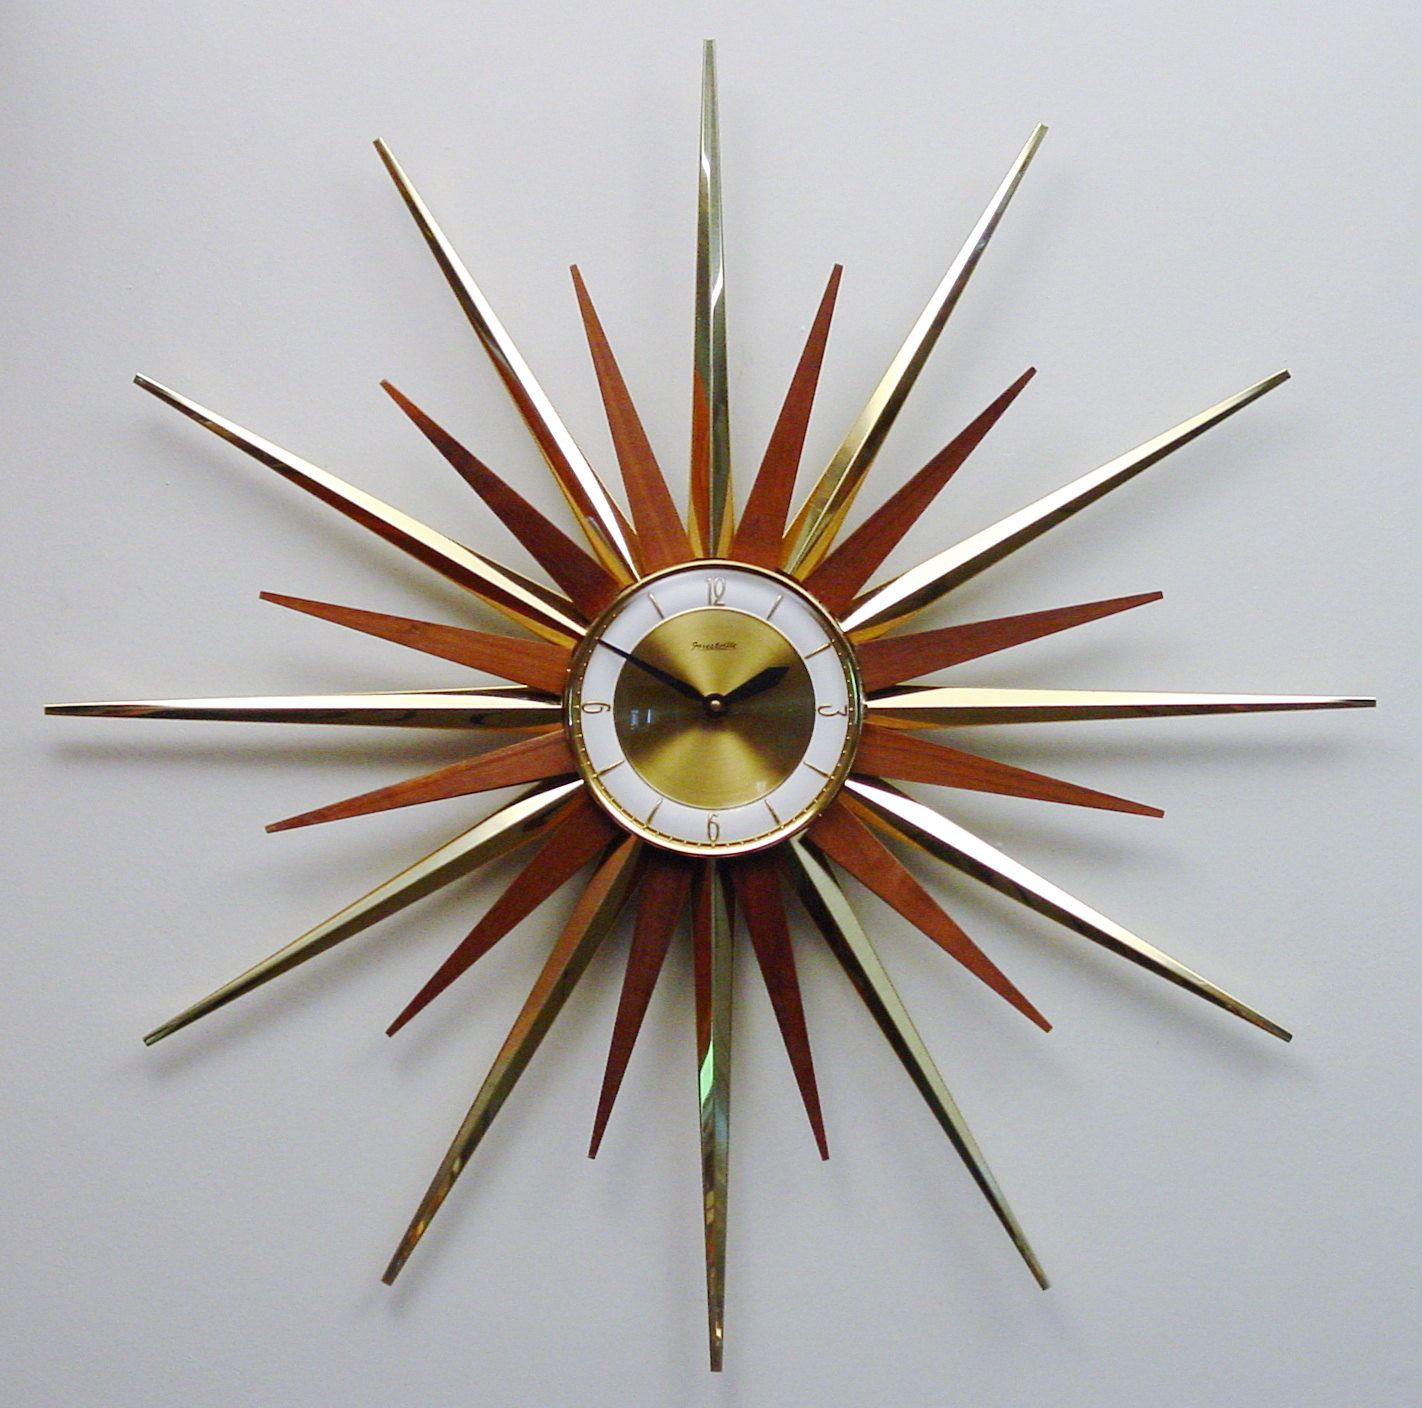 Bon Mid Century Modern Starburst Wall Clock By Forestville, Atomic Fireworks  Starburst Modern 1960s Hanging Clock